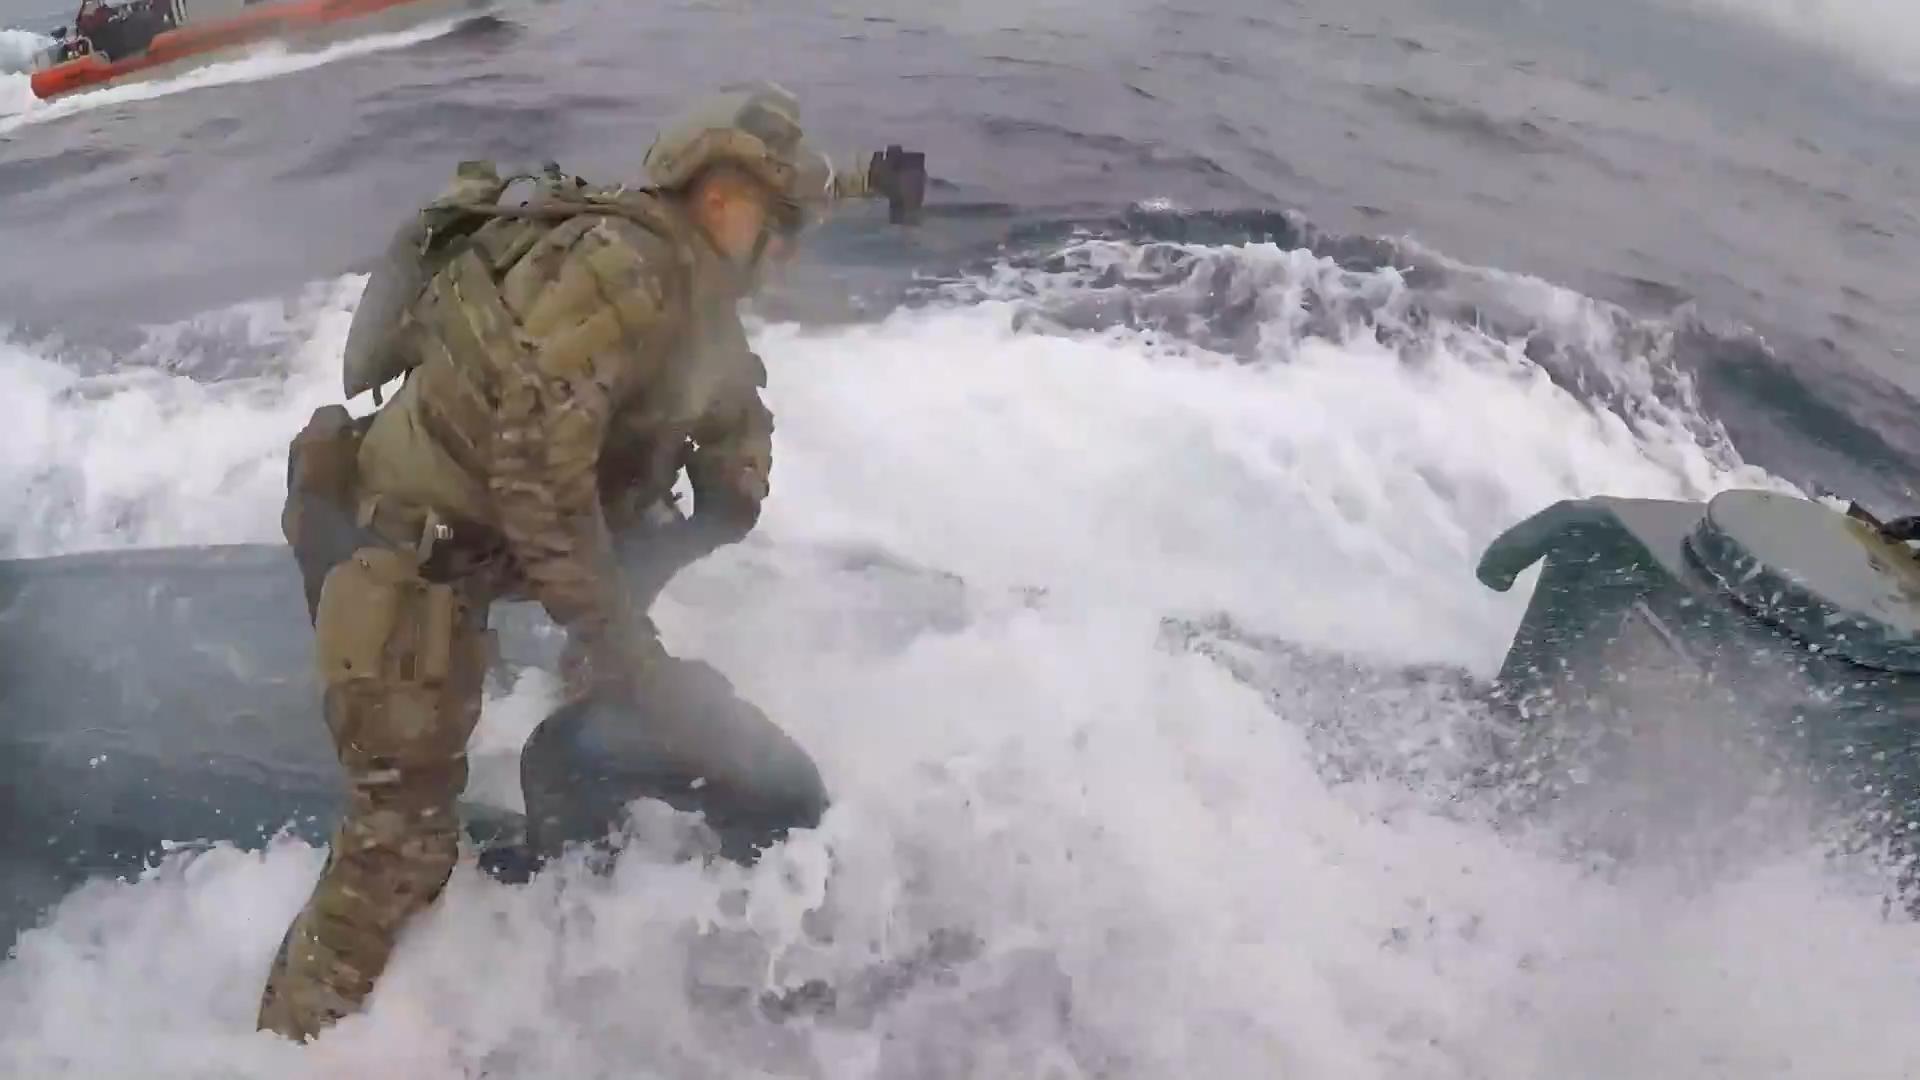 Notizia - USA - Guardia costiera assalta sottomarino narcos